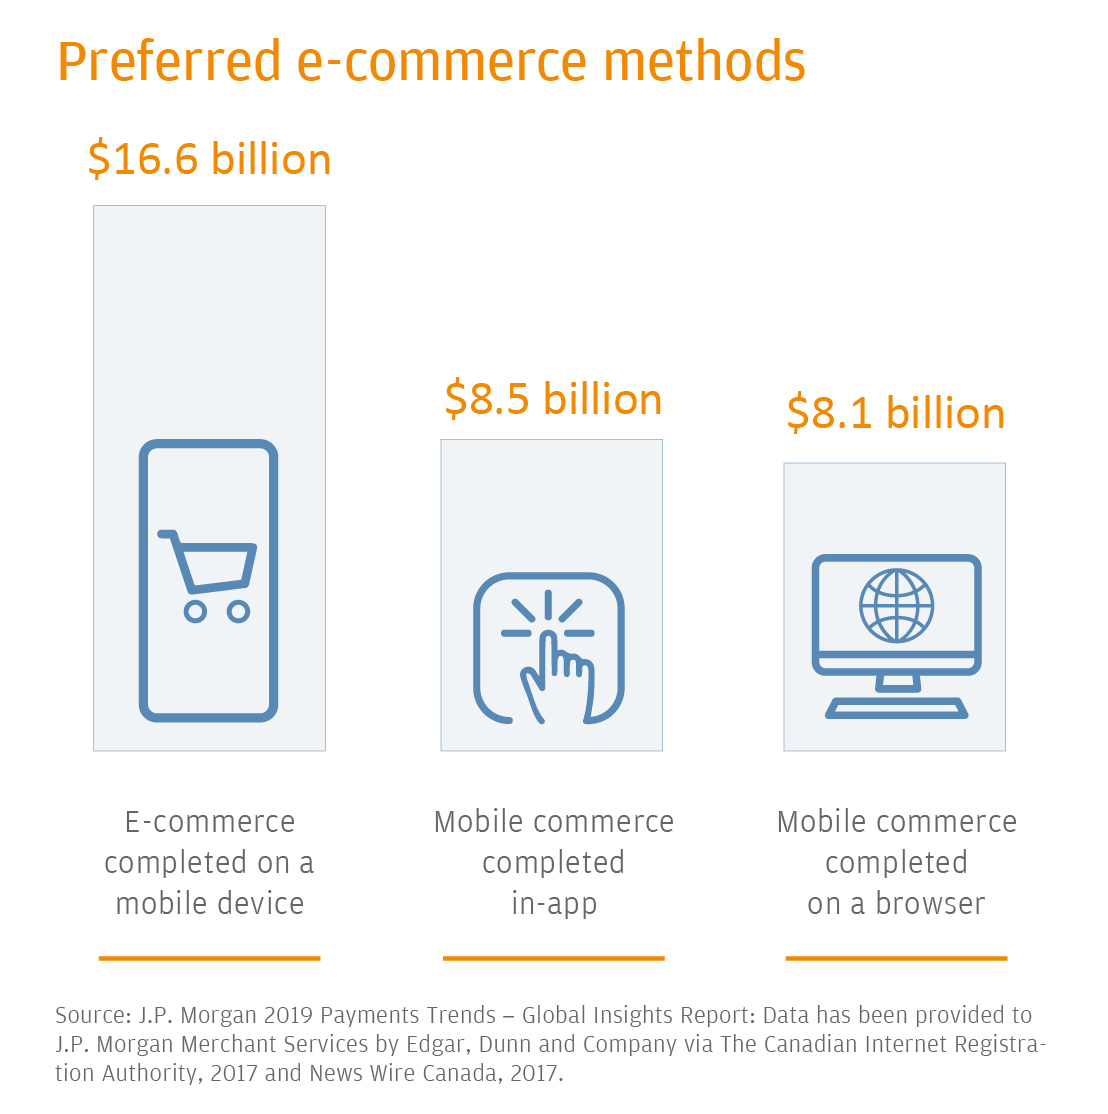 E-commerce Methods in Canada